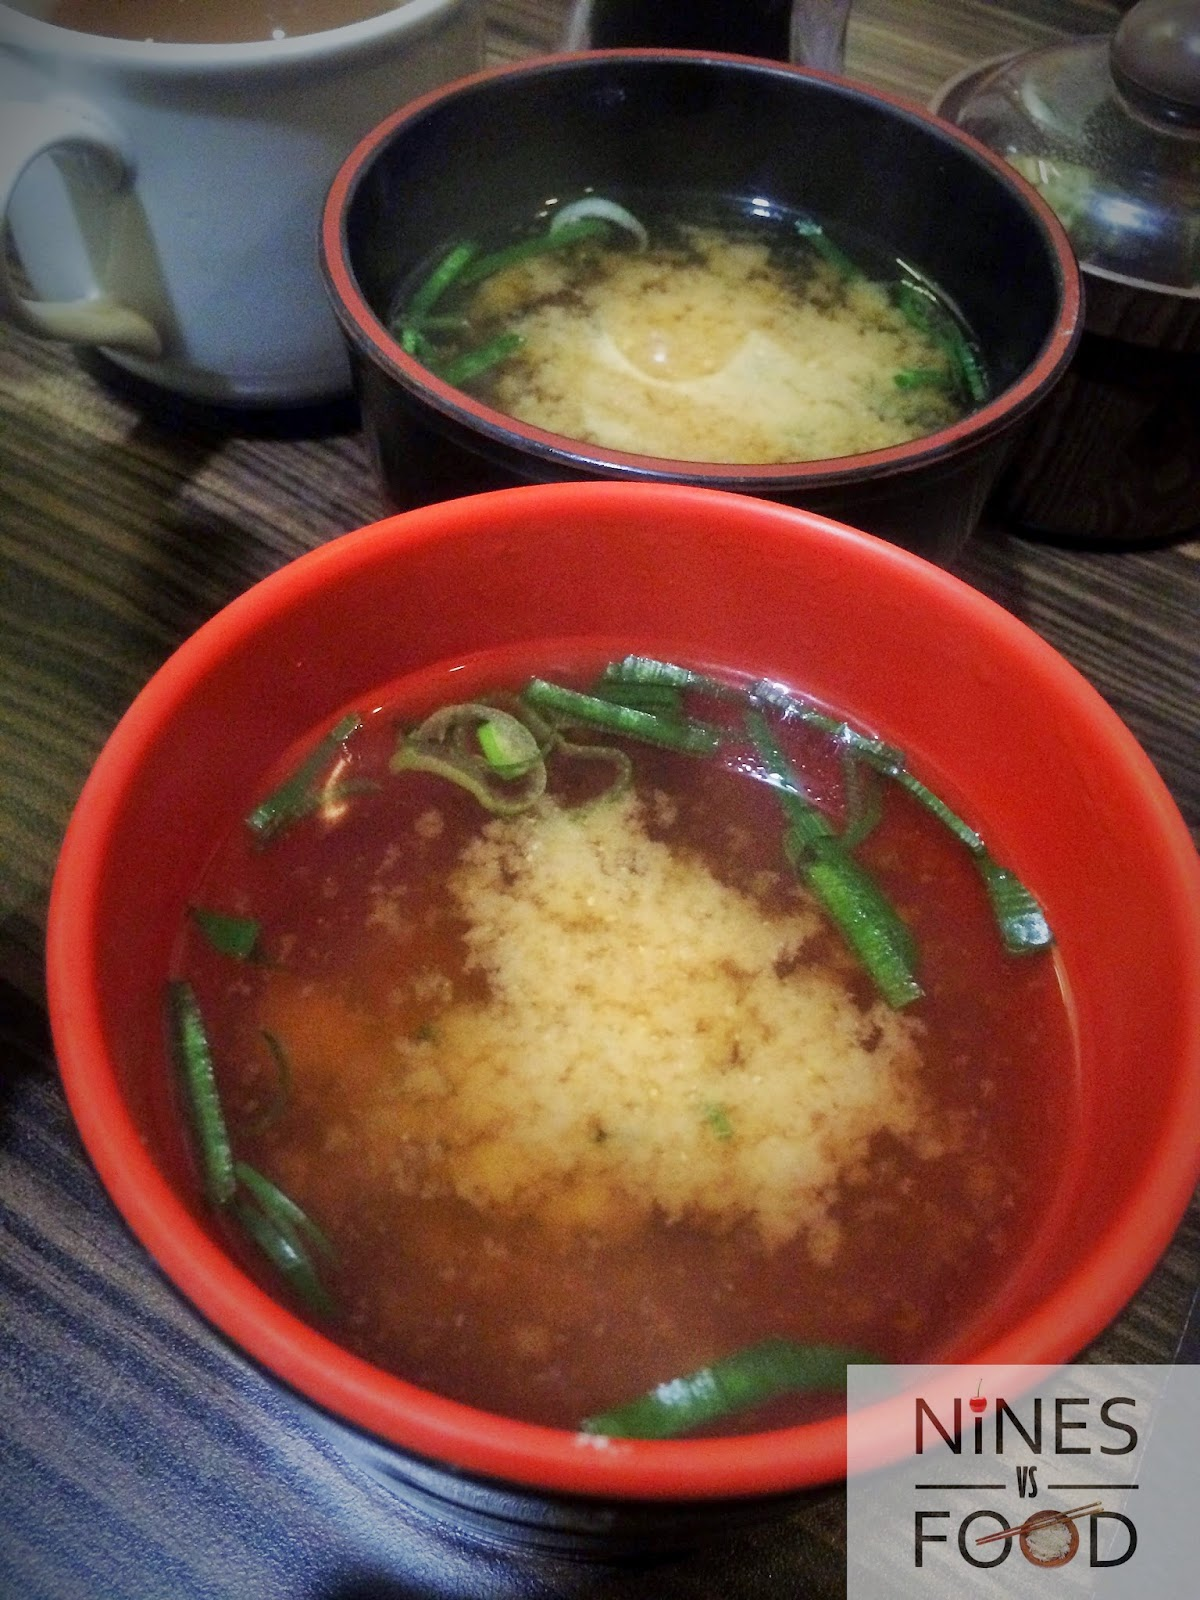 Nines vs. Food - Genji M Kalayaan Makati-15.jpg